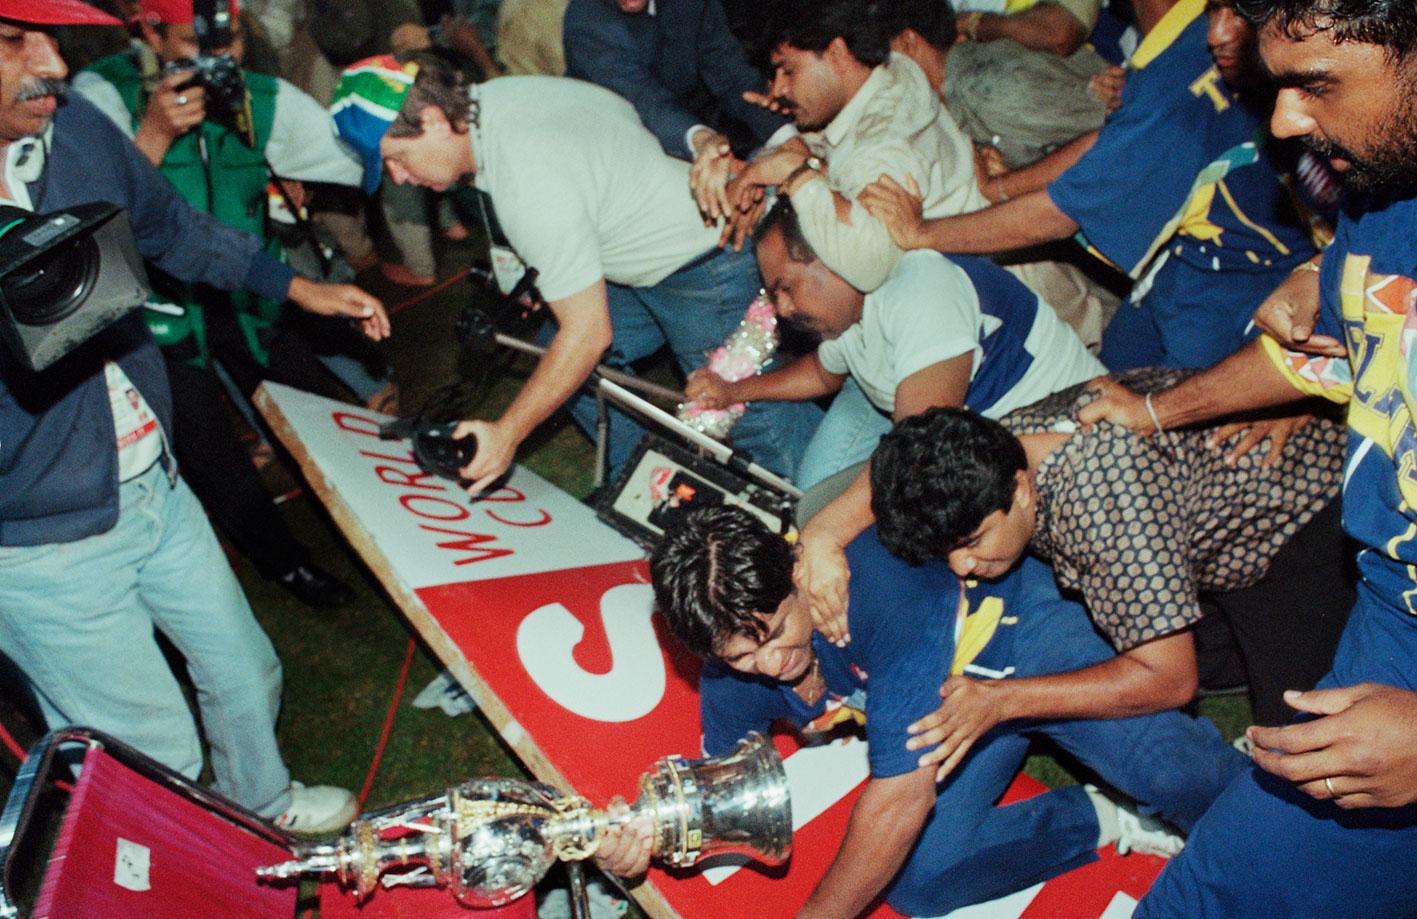 Arjuna Ranatunga clutching the World Cup trophy // Trent Parke / Magnum Photos